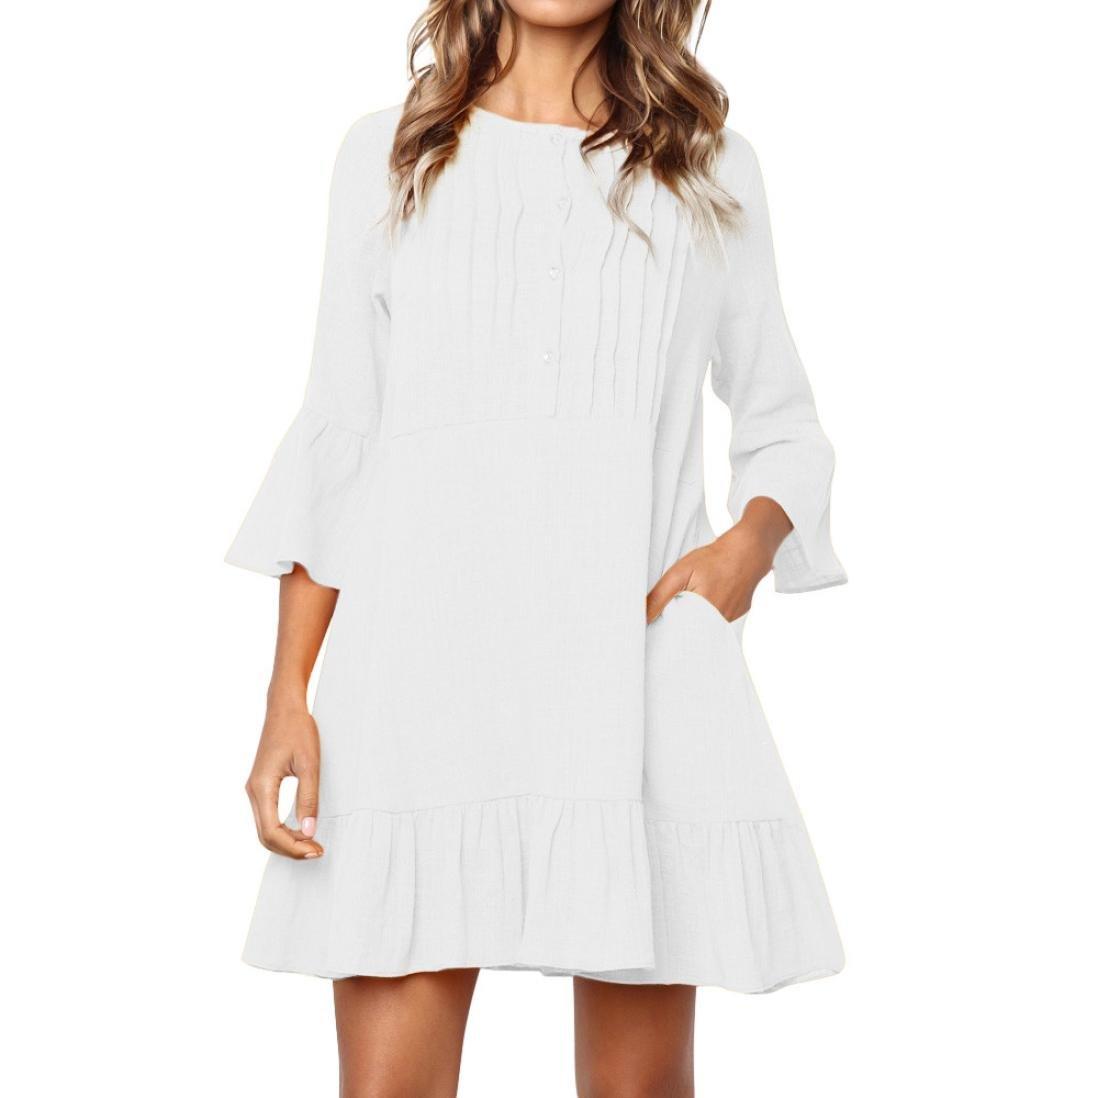 Spbamboo Women Button O Neck Boho Three Quarter Casual Mini Beachwear Dress